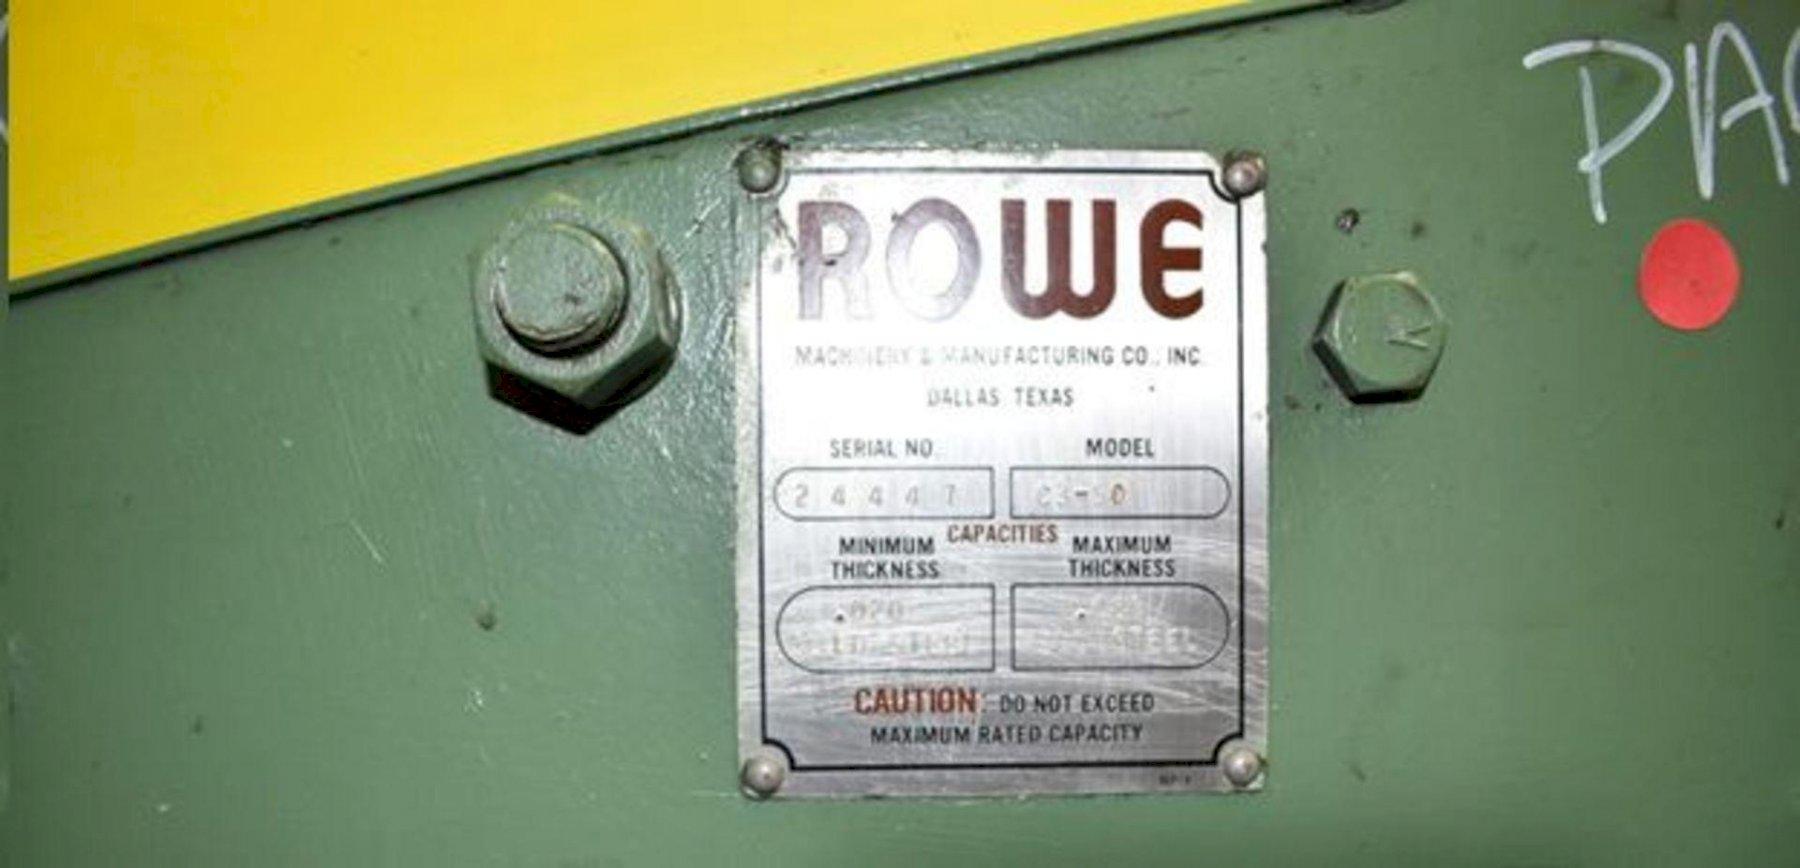 "50"" X 0.085"" ROWE MODEL C3-50 AIR POWER STRAIGHTENER. STOCK # 0738424"